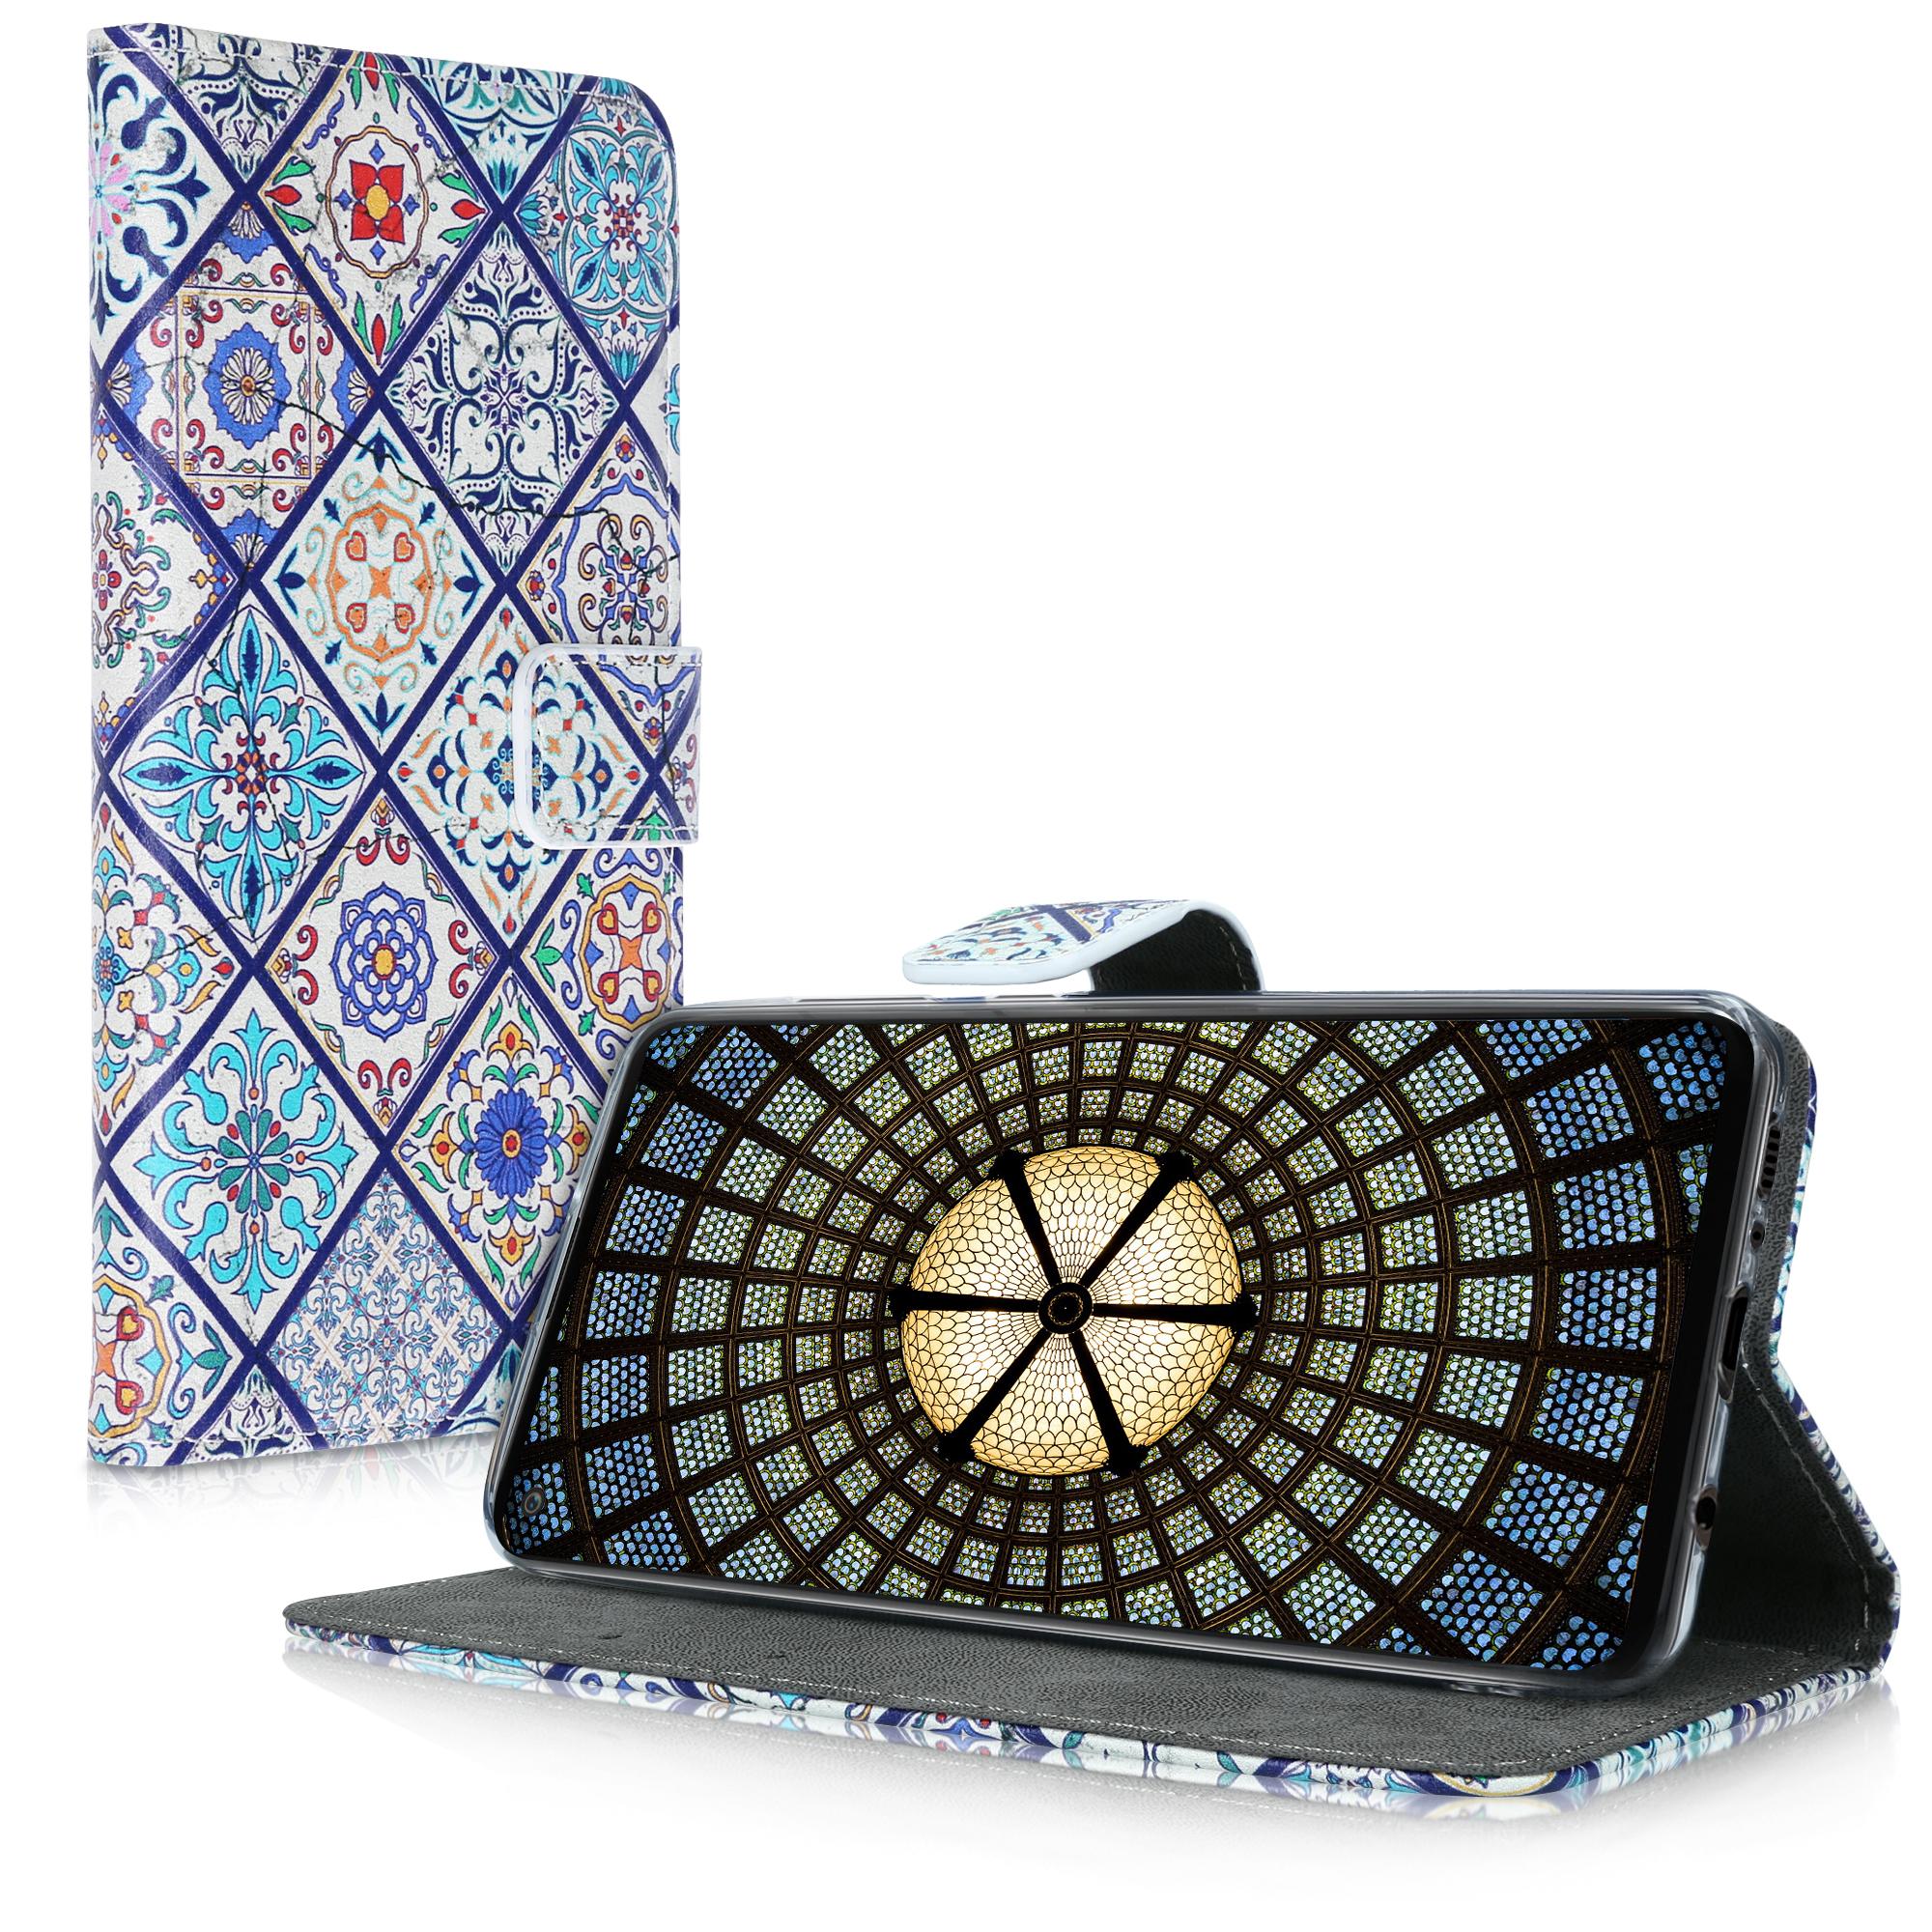 Kožené pouzdro pro Samsung A21s - Moroccan Vibes v vícebarevná modré / oranžová / bílá